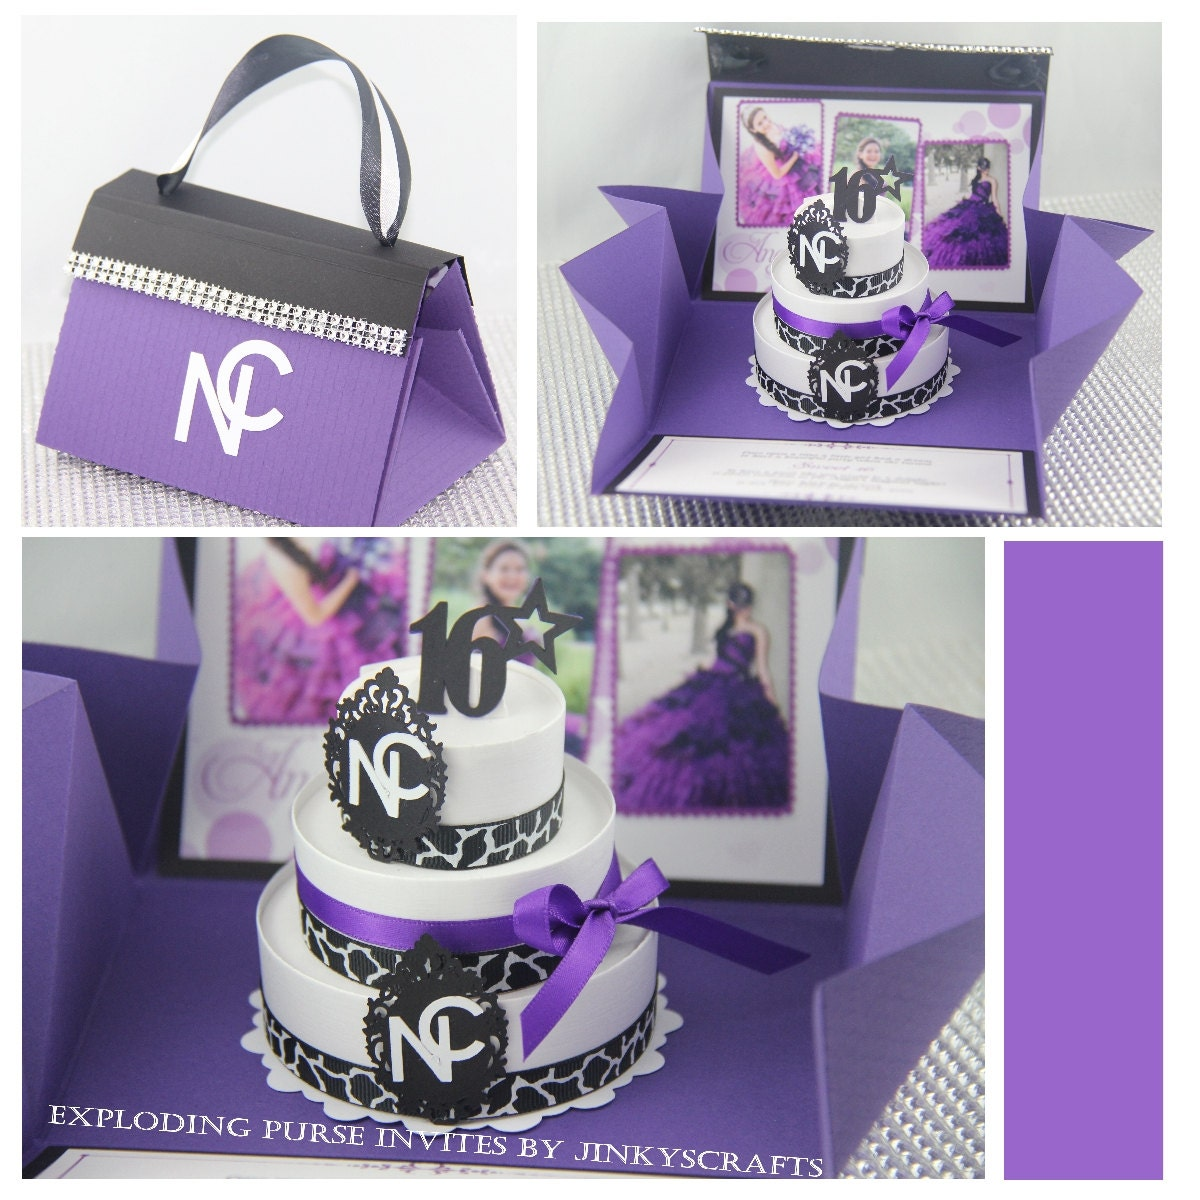 Wedding Gift Deposit Box : Quinceanera Box Invitations Wedding box invitation,